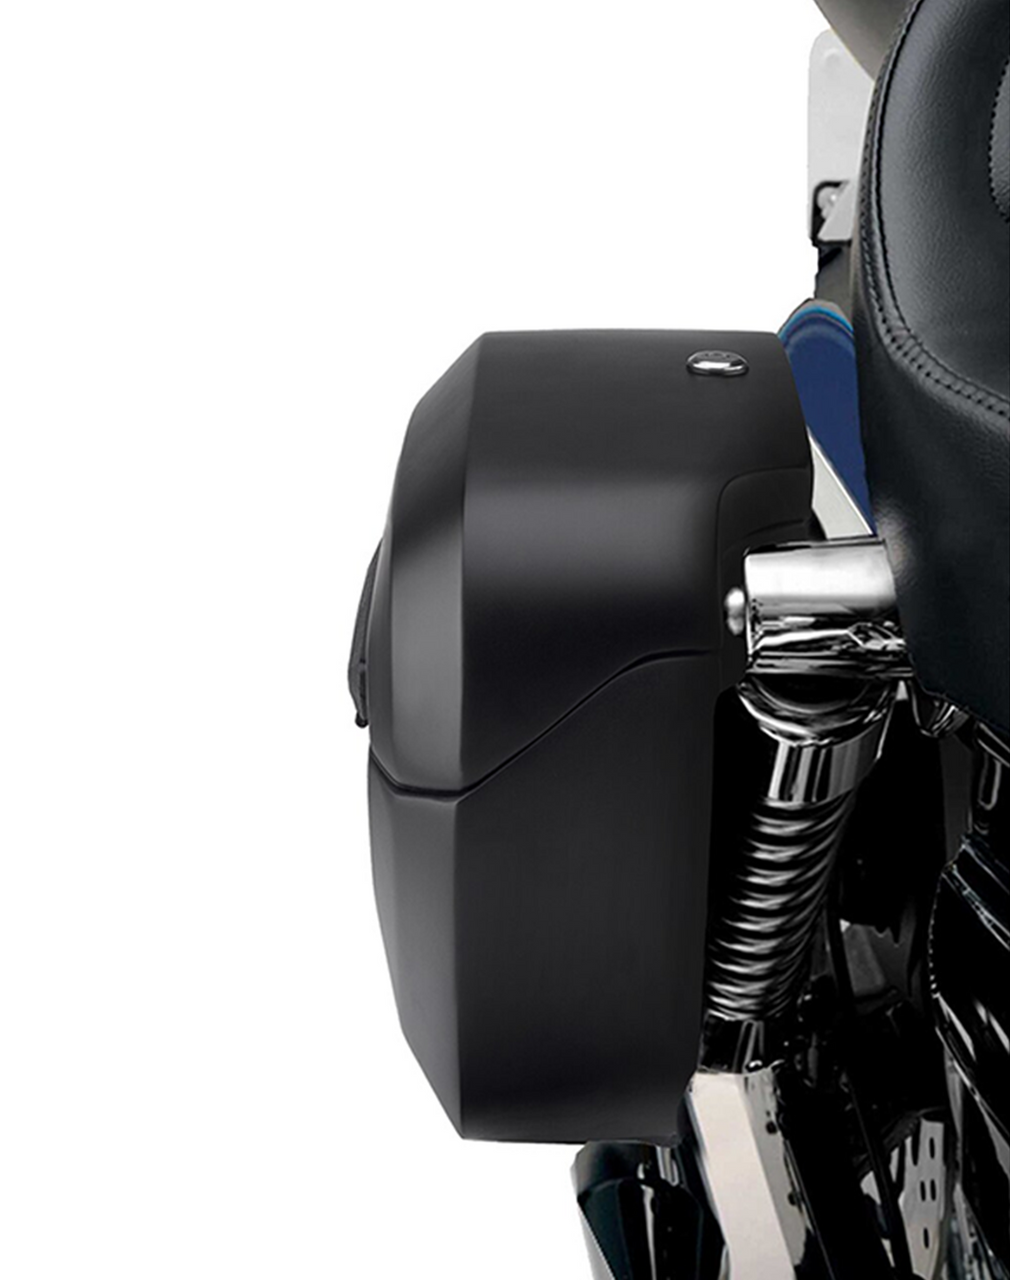 Viking Lamellar Shock Cutout Extra Large Matte Motorcycle Hard Saddlebags For Honda VTX 1800 F Shock Cutout View